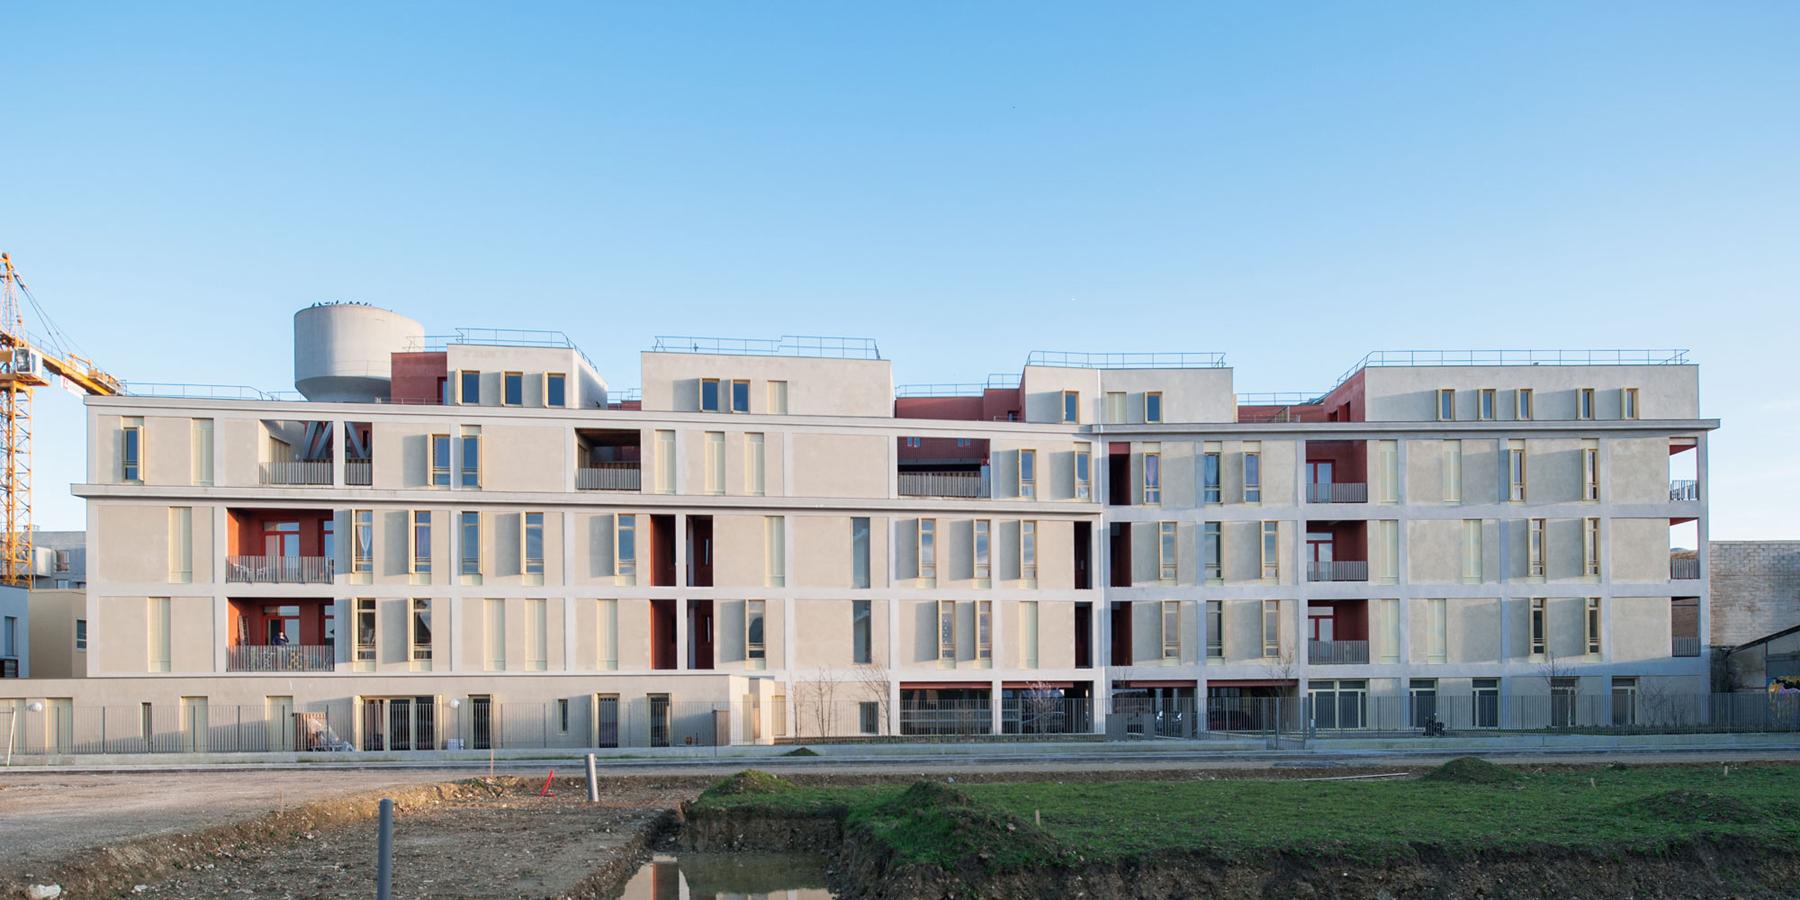 12-jam-SO2-bretigny-rehabilitation-usine-clause-facade-sud-ouest